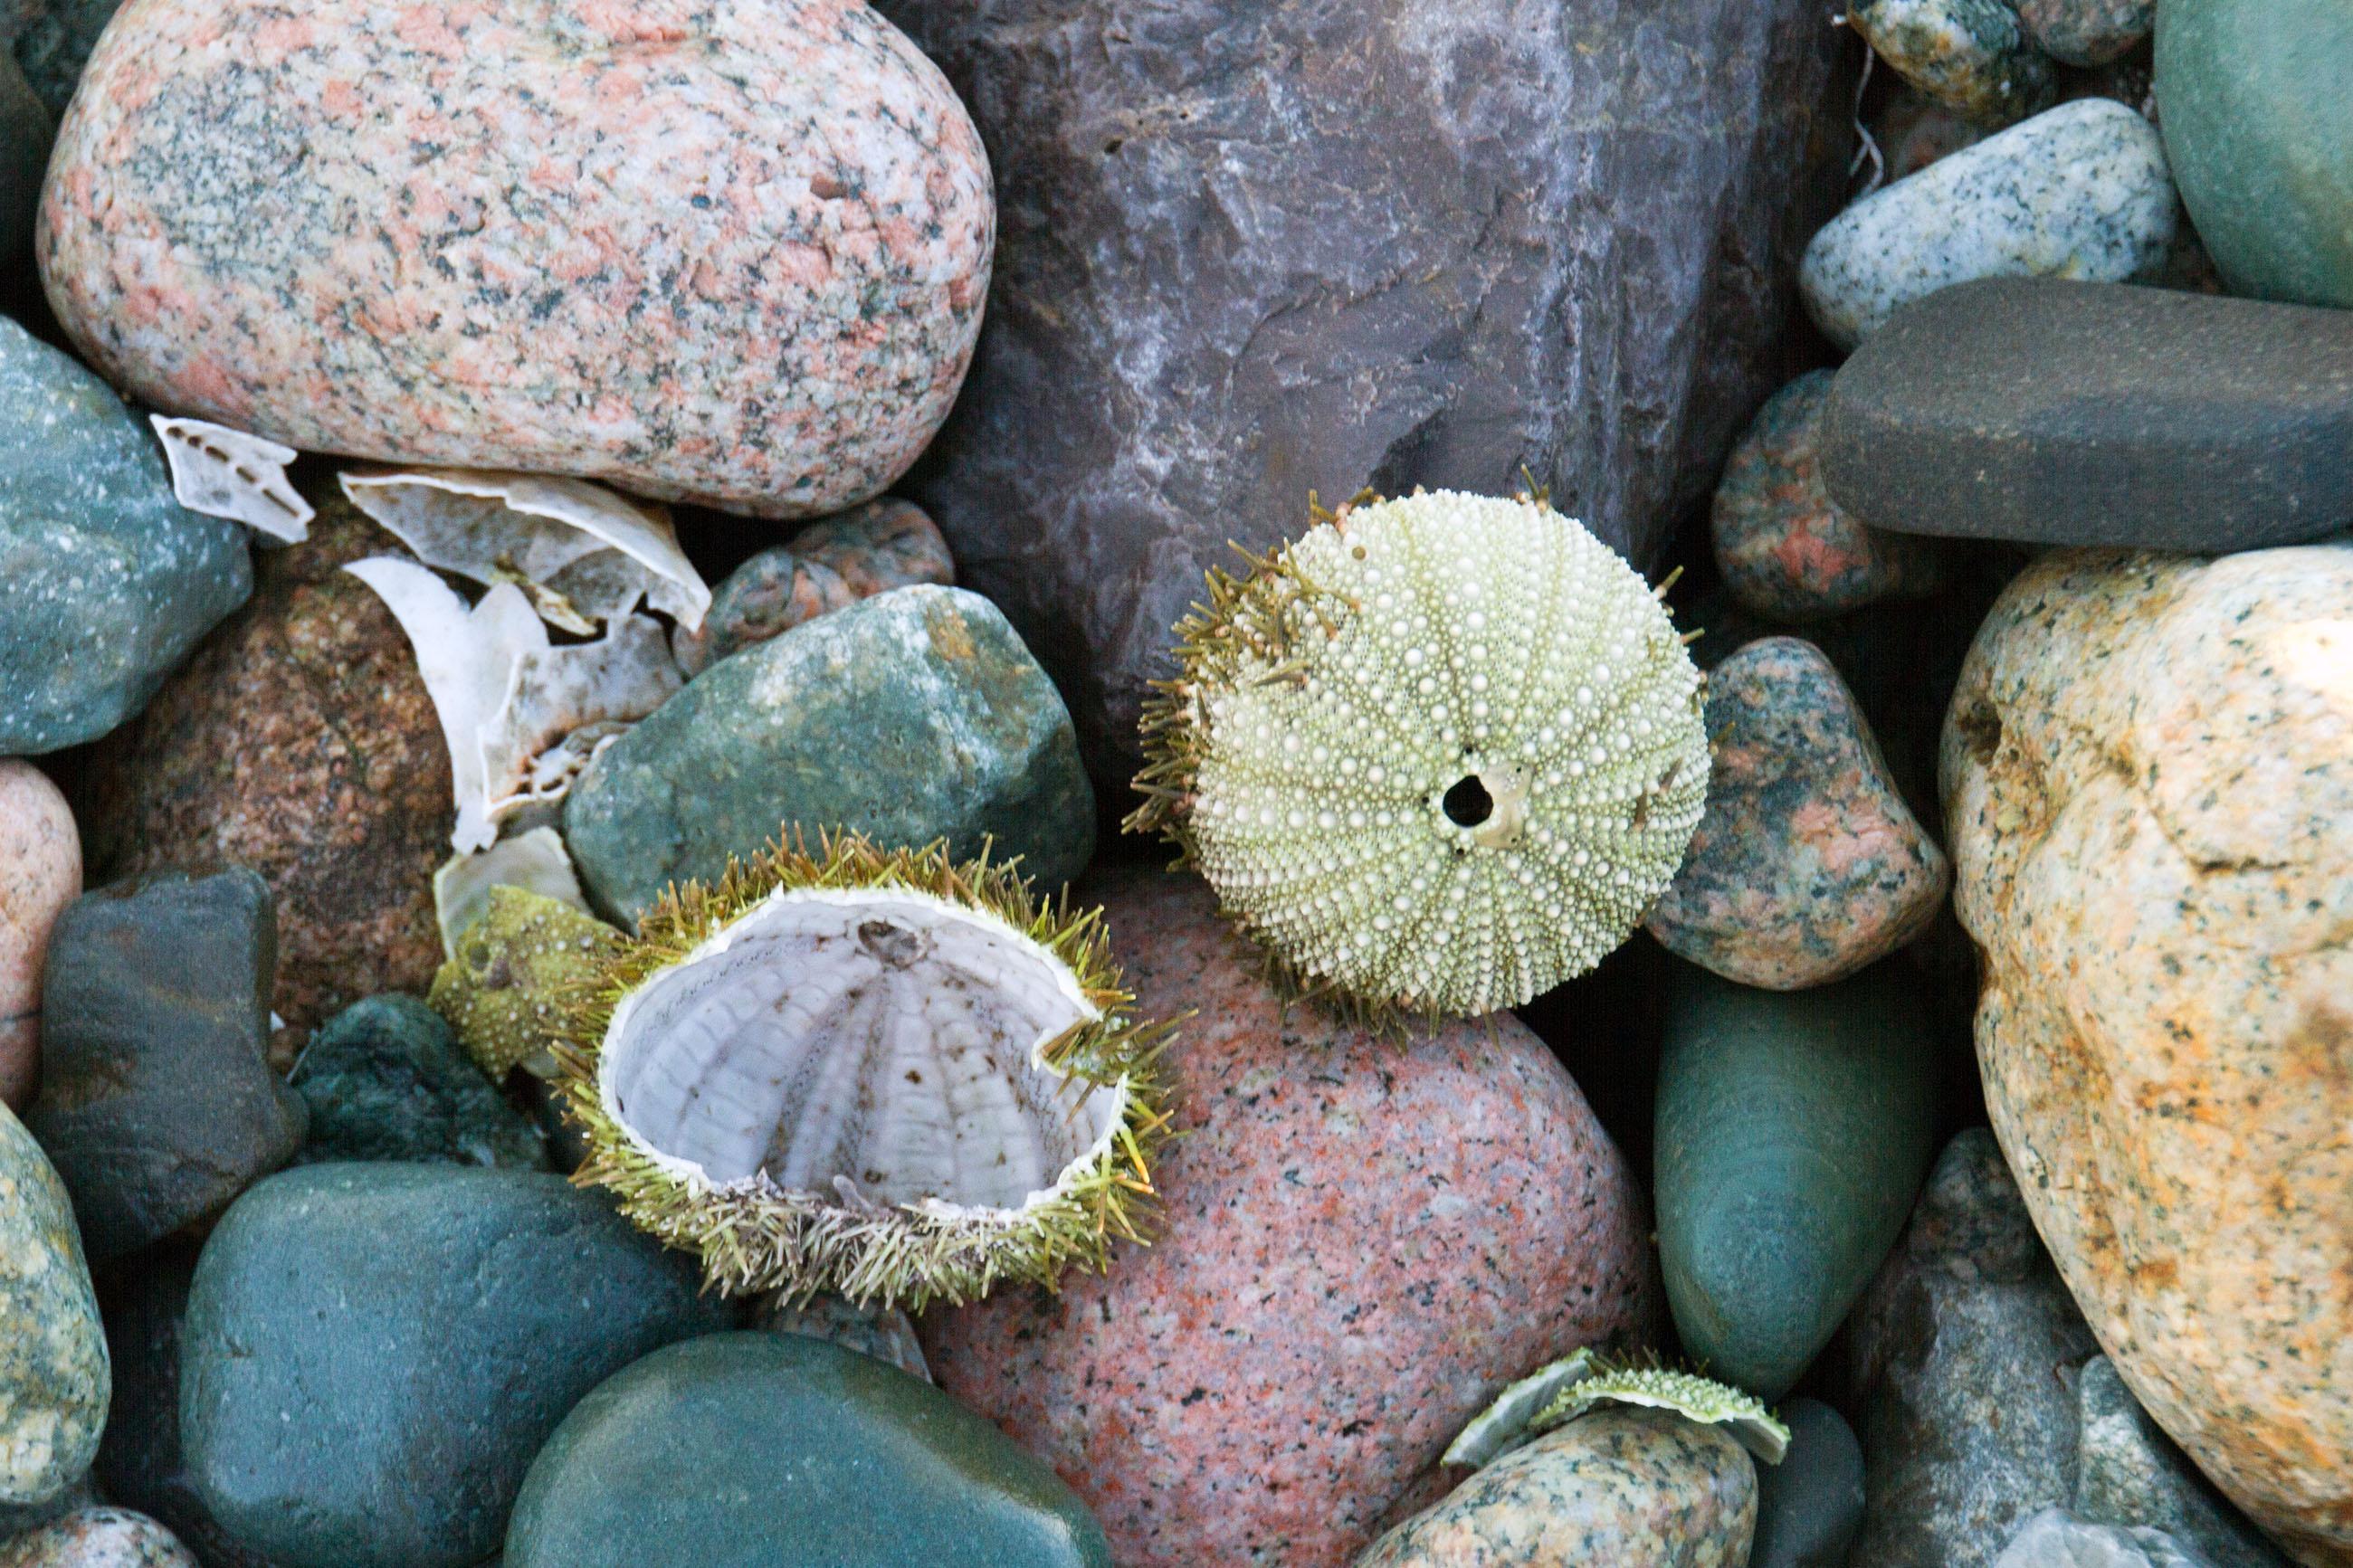 Sea urchin photo